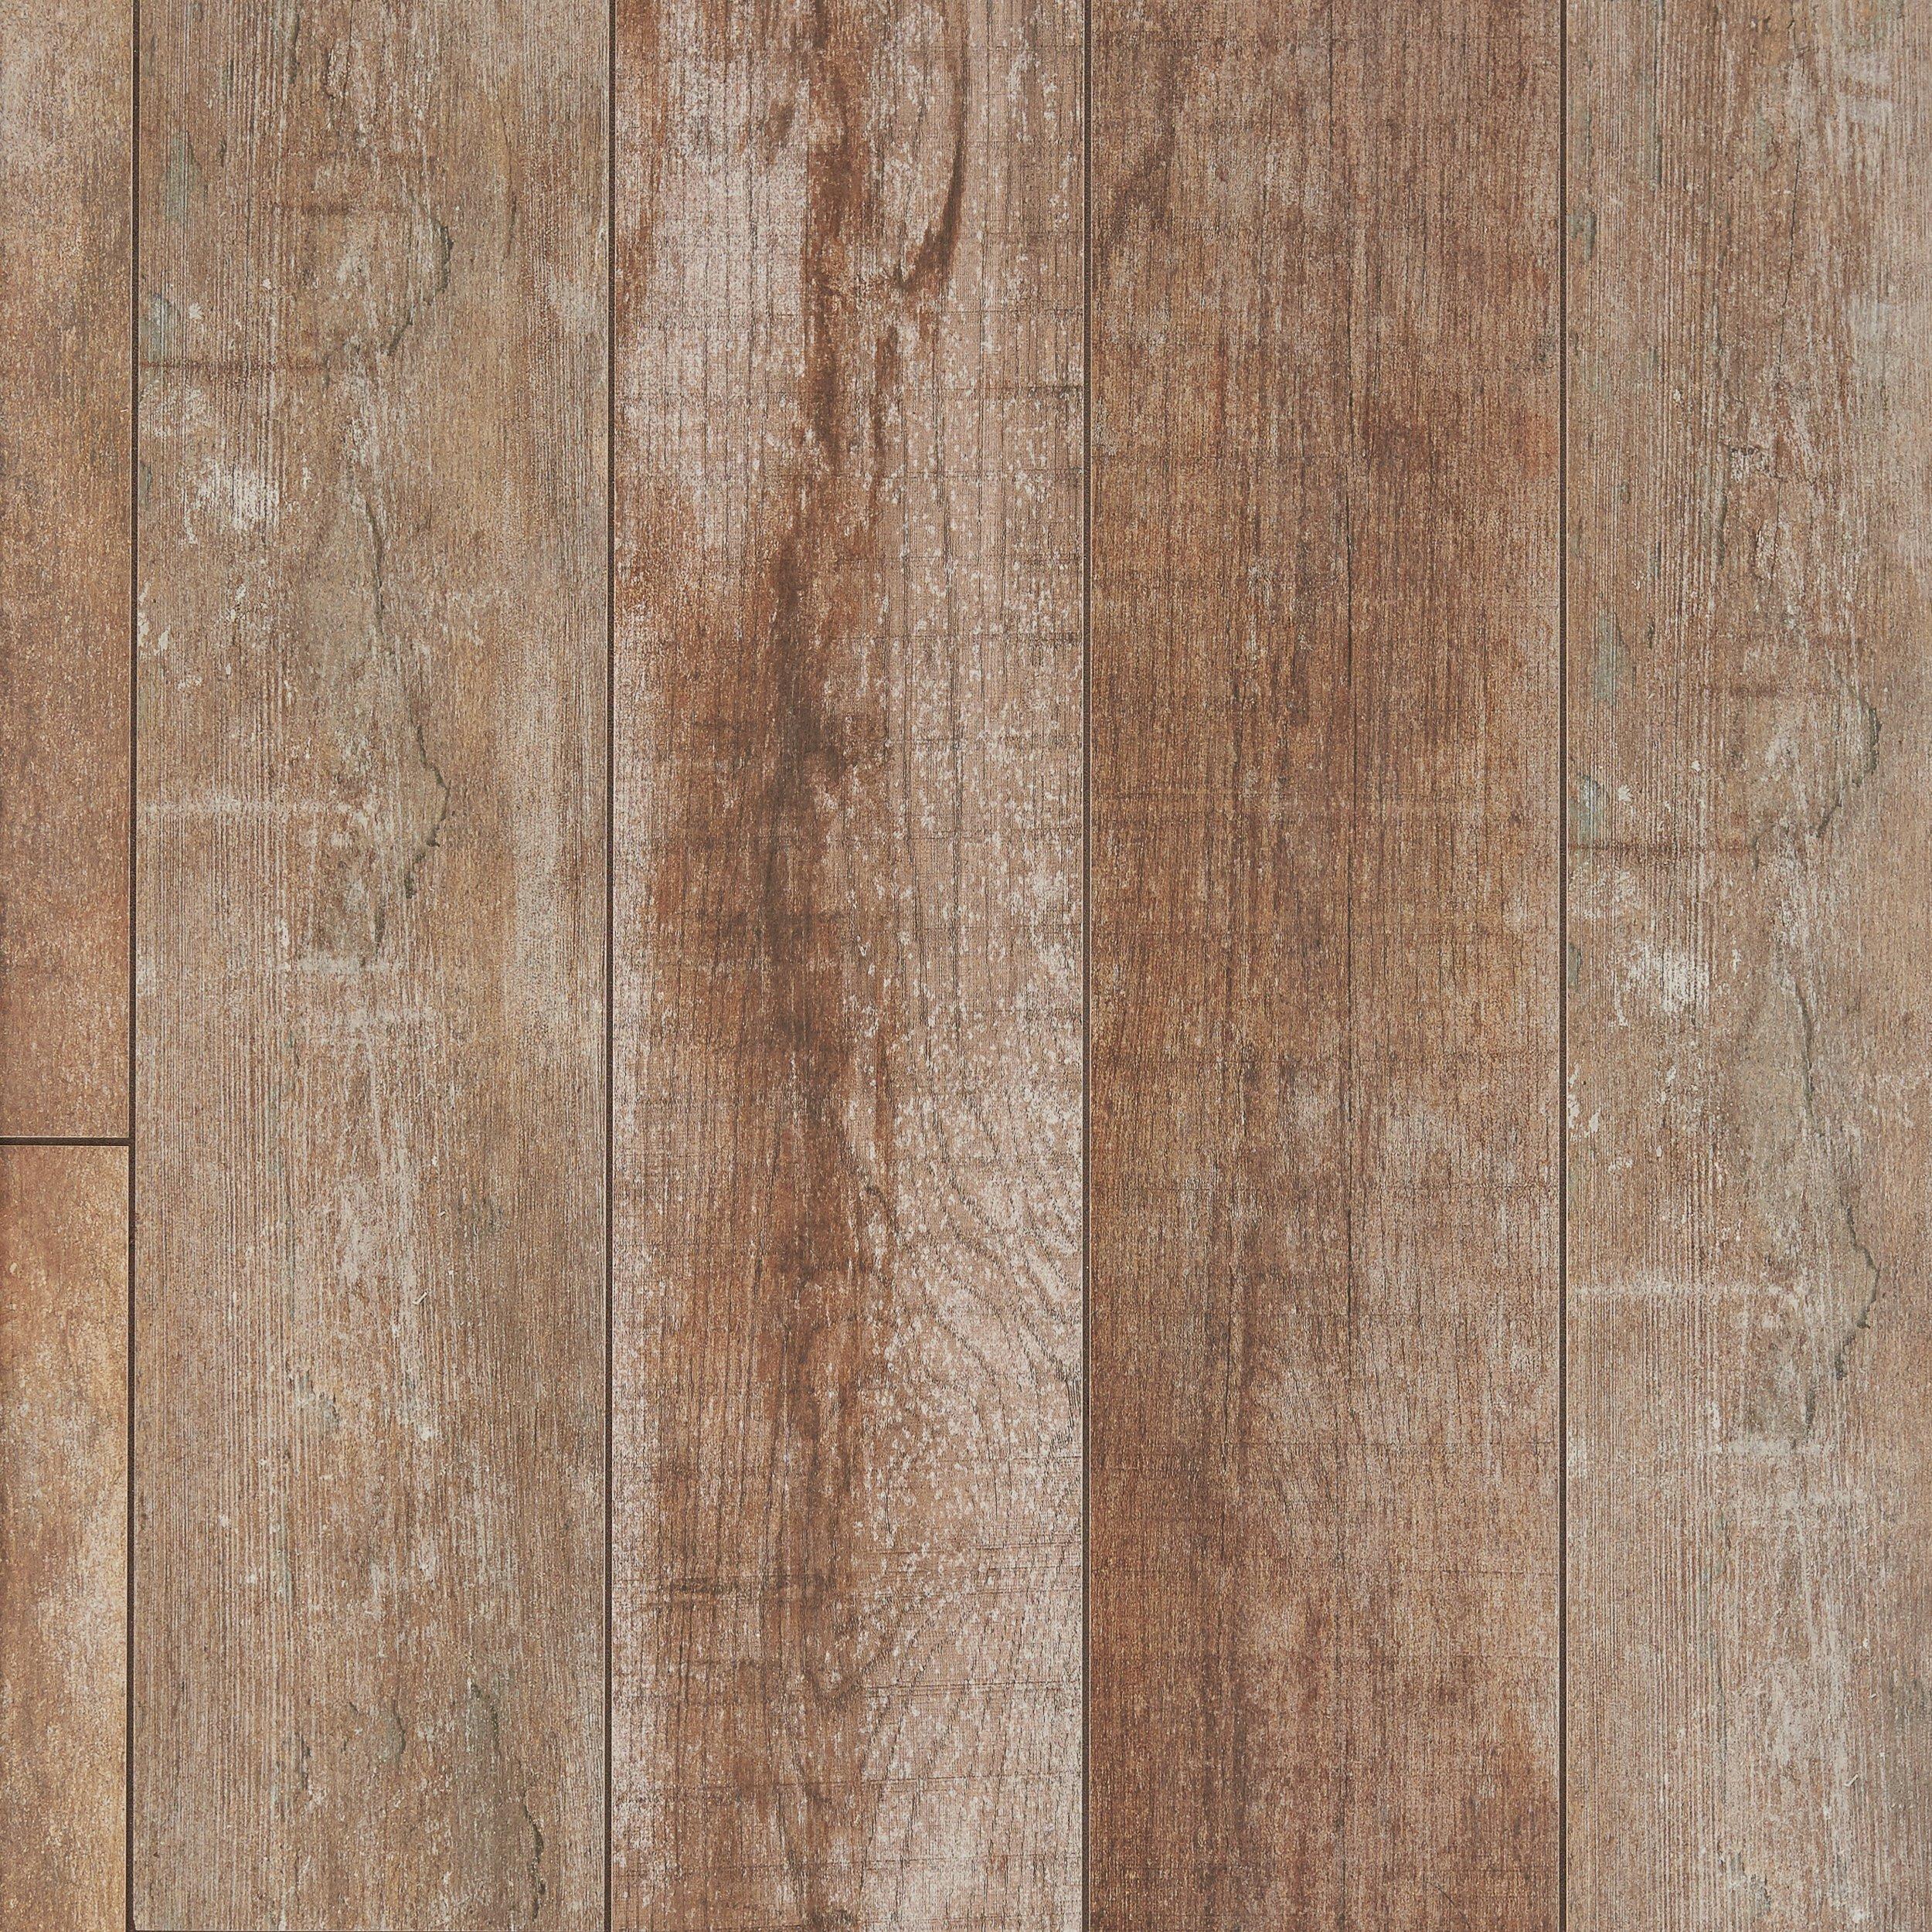 Porcelain Tile Wood Plank: Truewood Cream Wood Plank Porcelain Tile